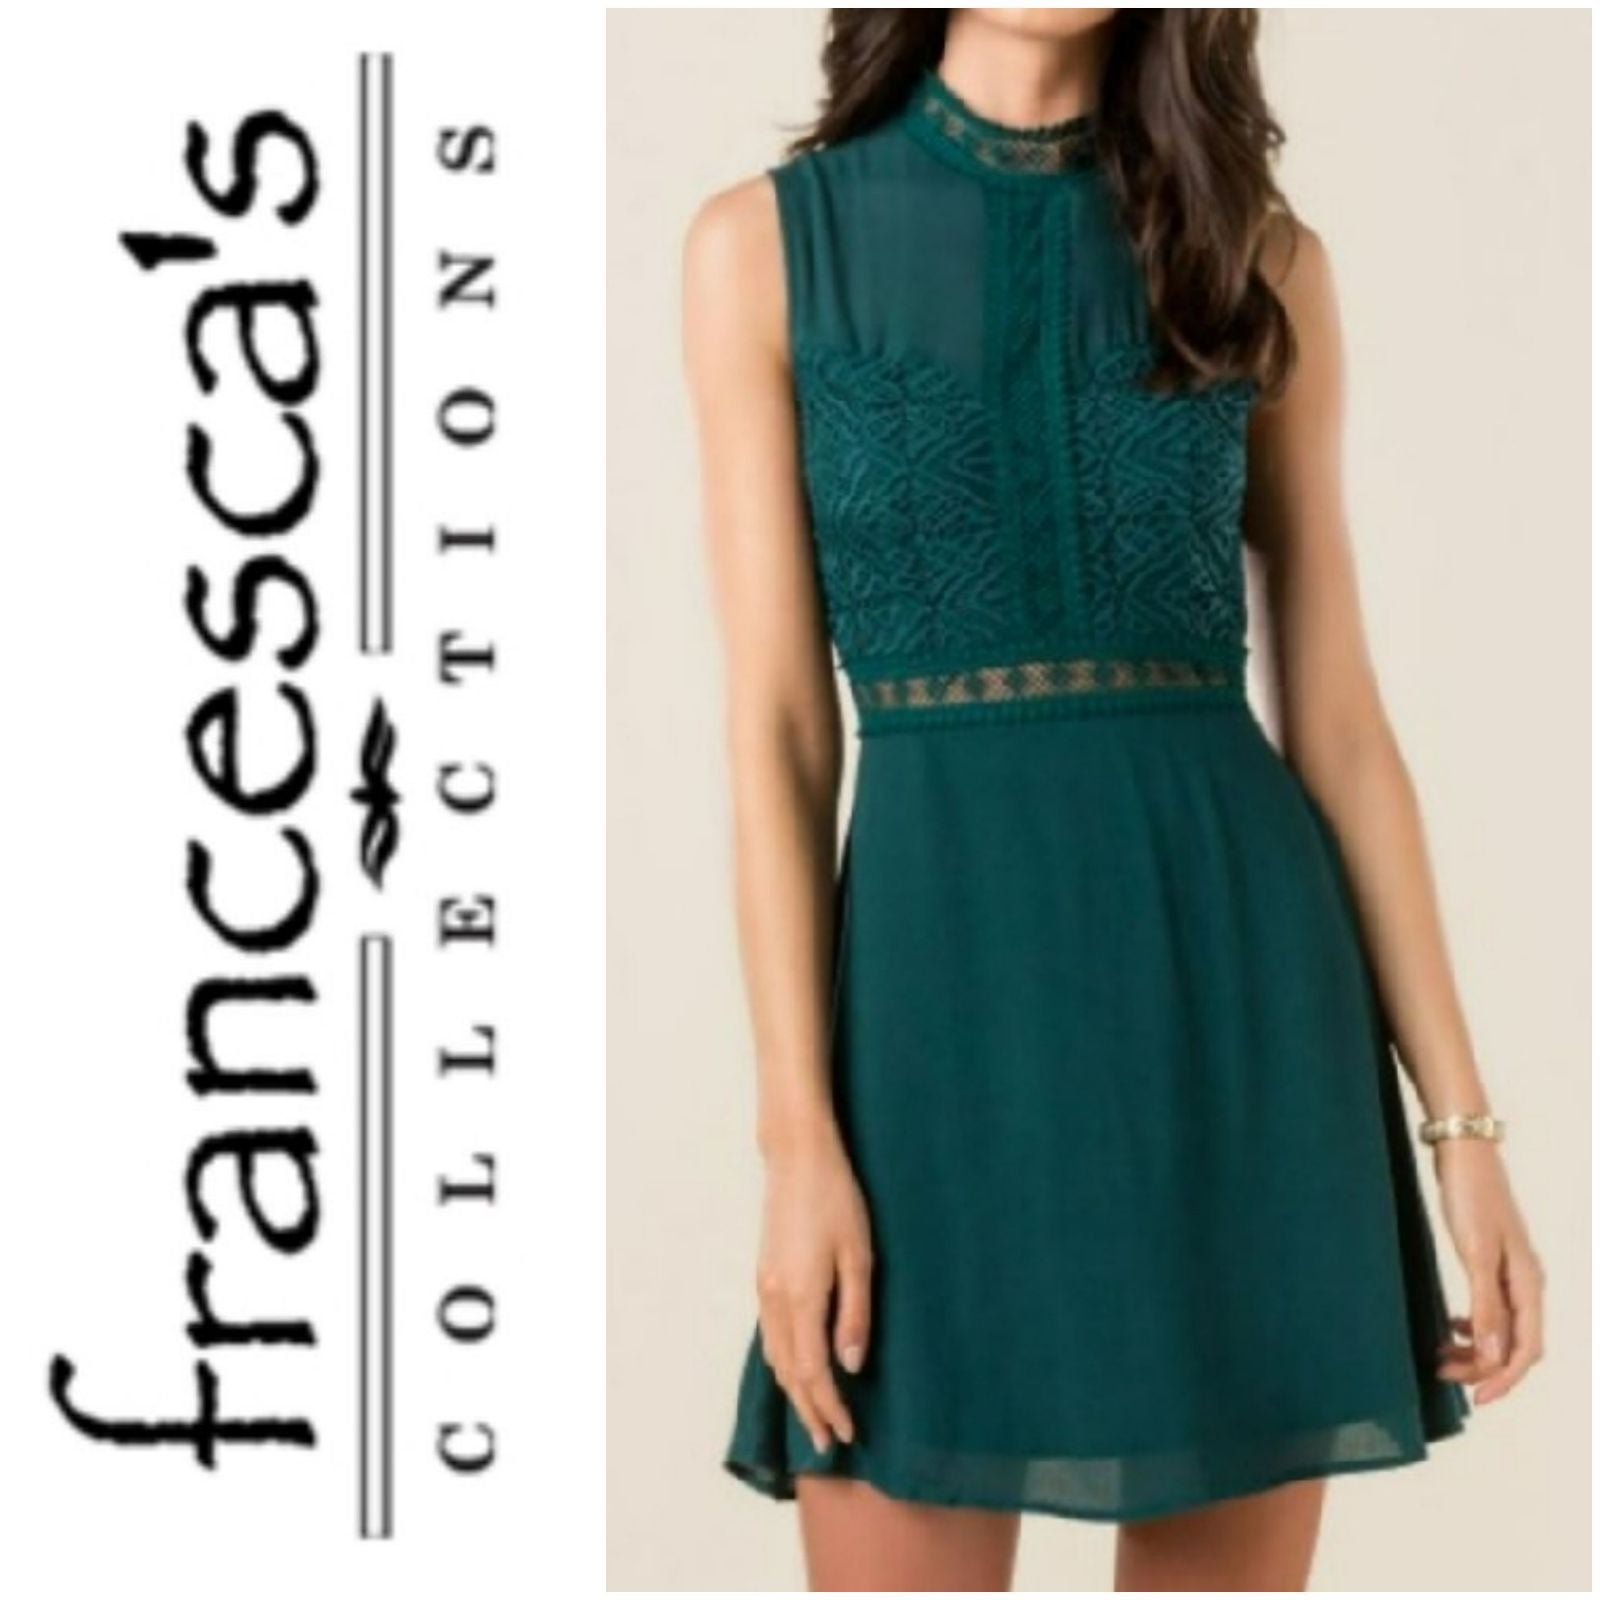 Francesca's Veronica Lace Dress Emerald